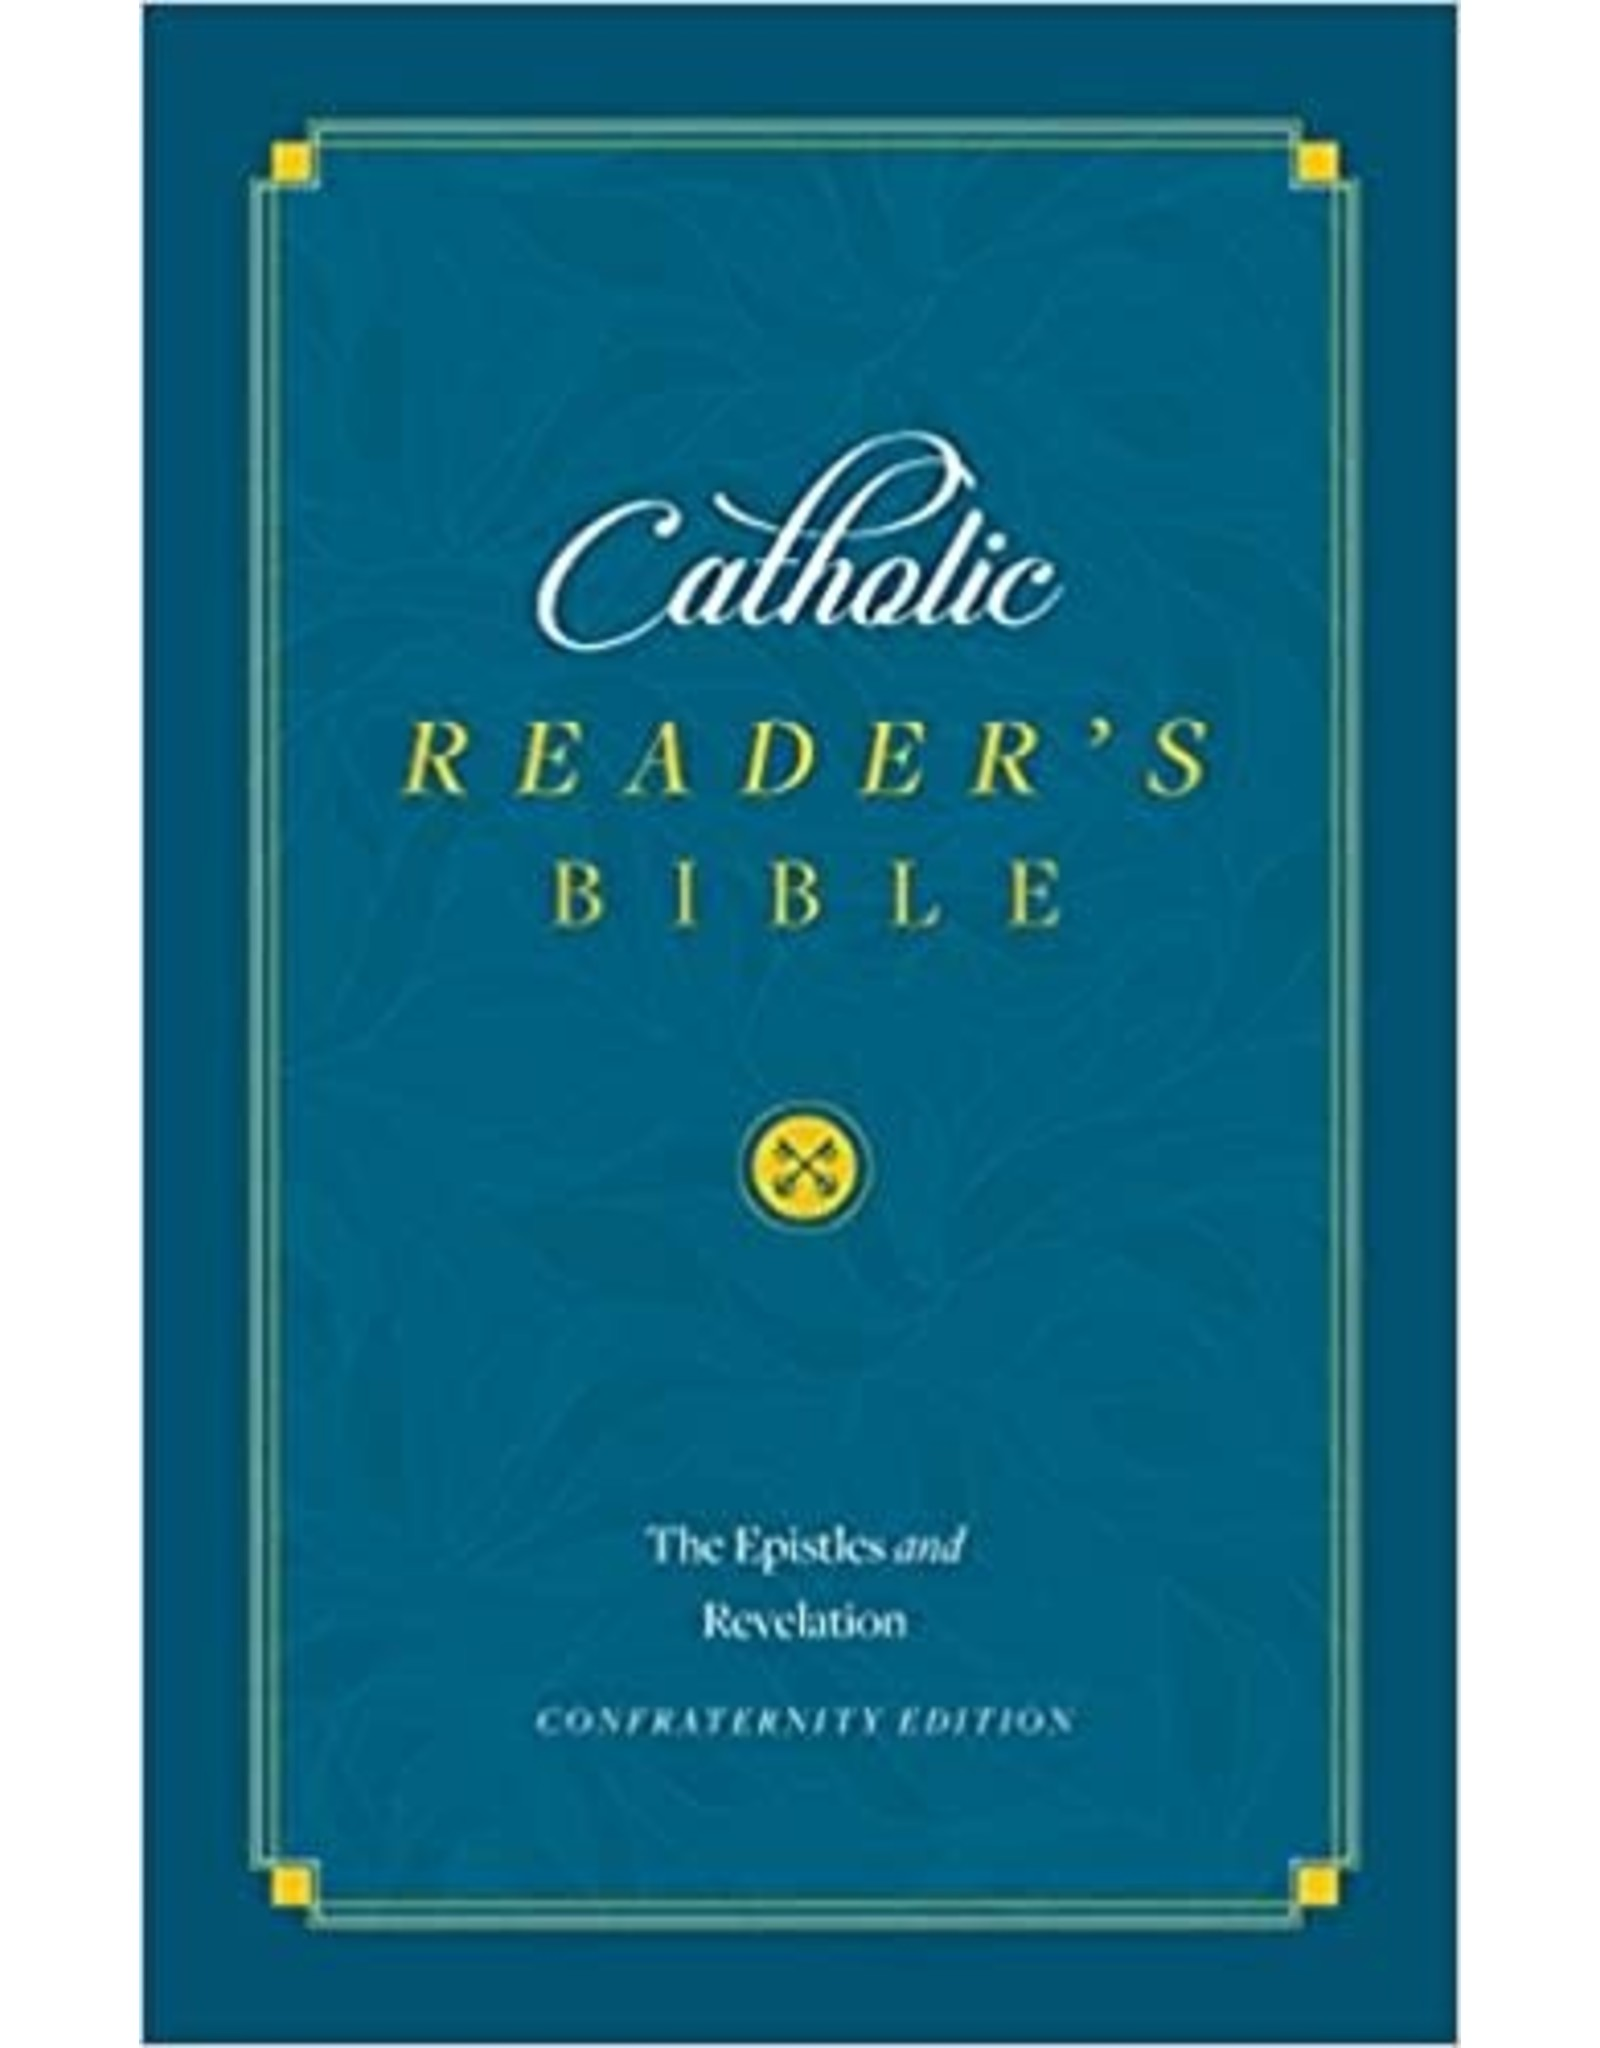 Sophia Press Catholic Reader's Bible: The Epistles and Revelation (Hardcover)